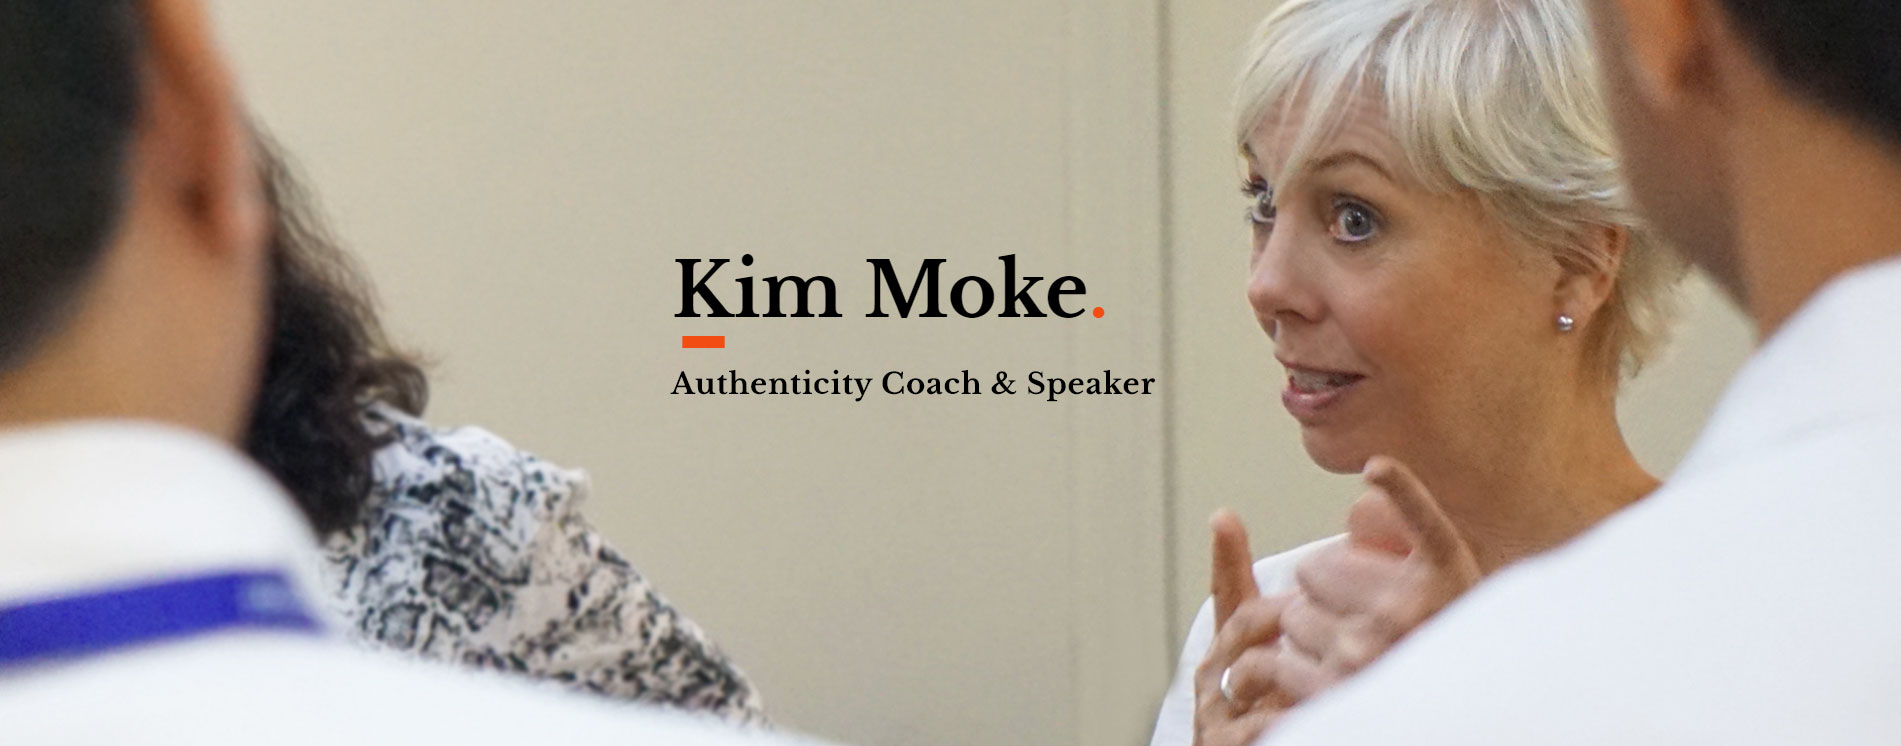 Kim Moke - Authenticity Coach - Speaker